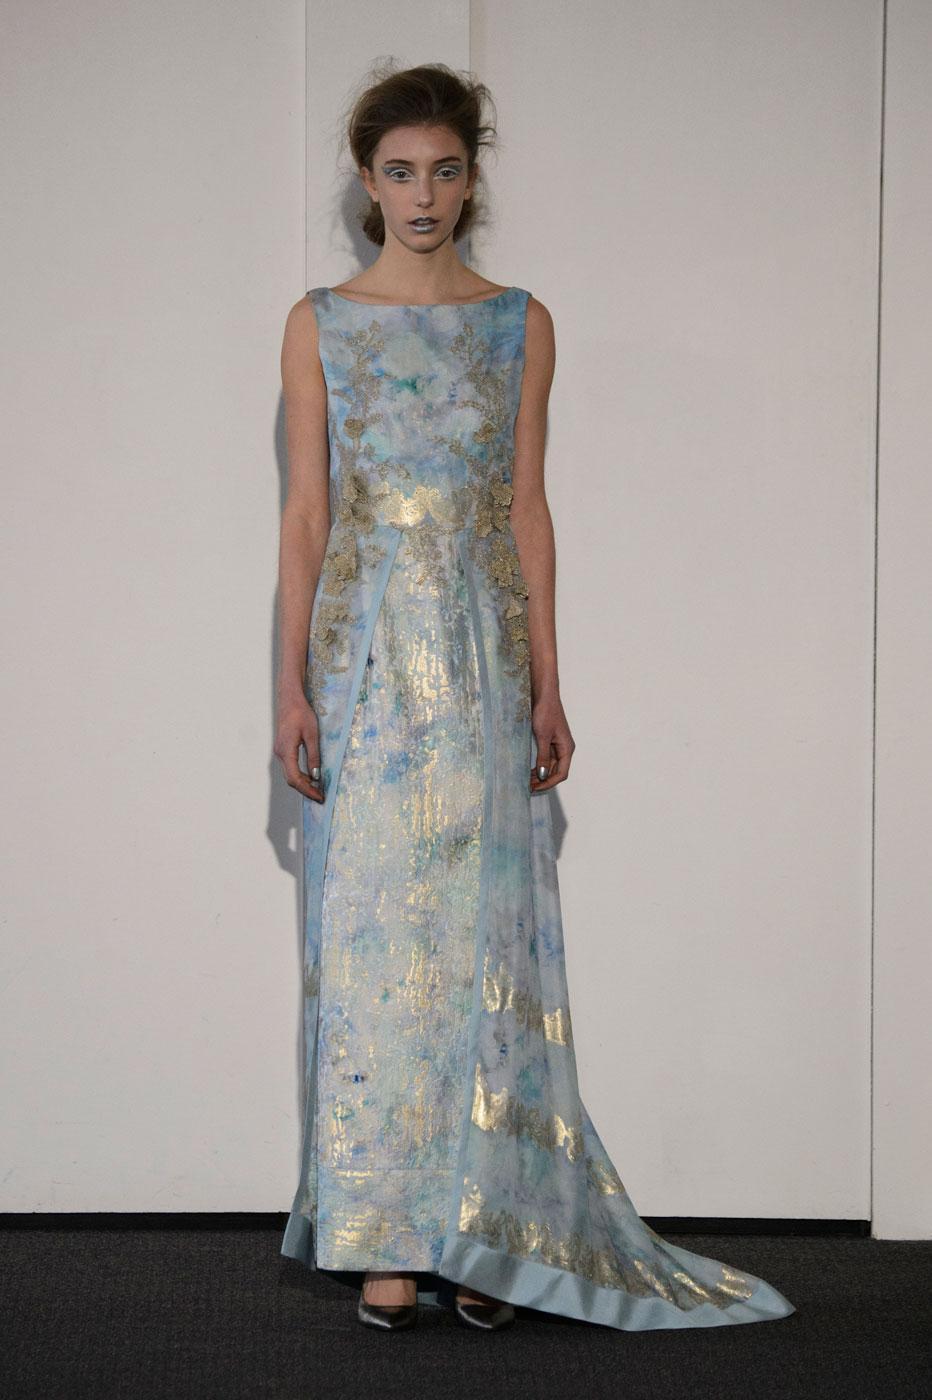 Busardi-fashion-runway-show-haute-couture-paris-spring-2015-the-impression-49